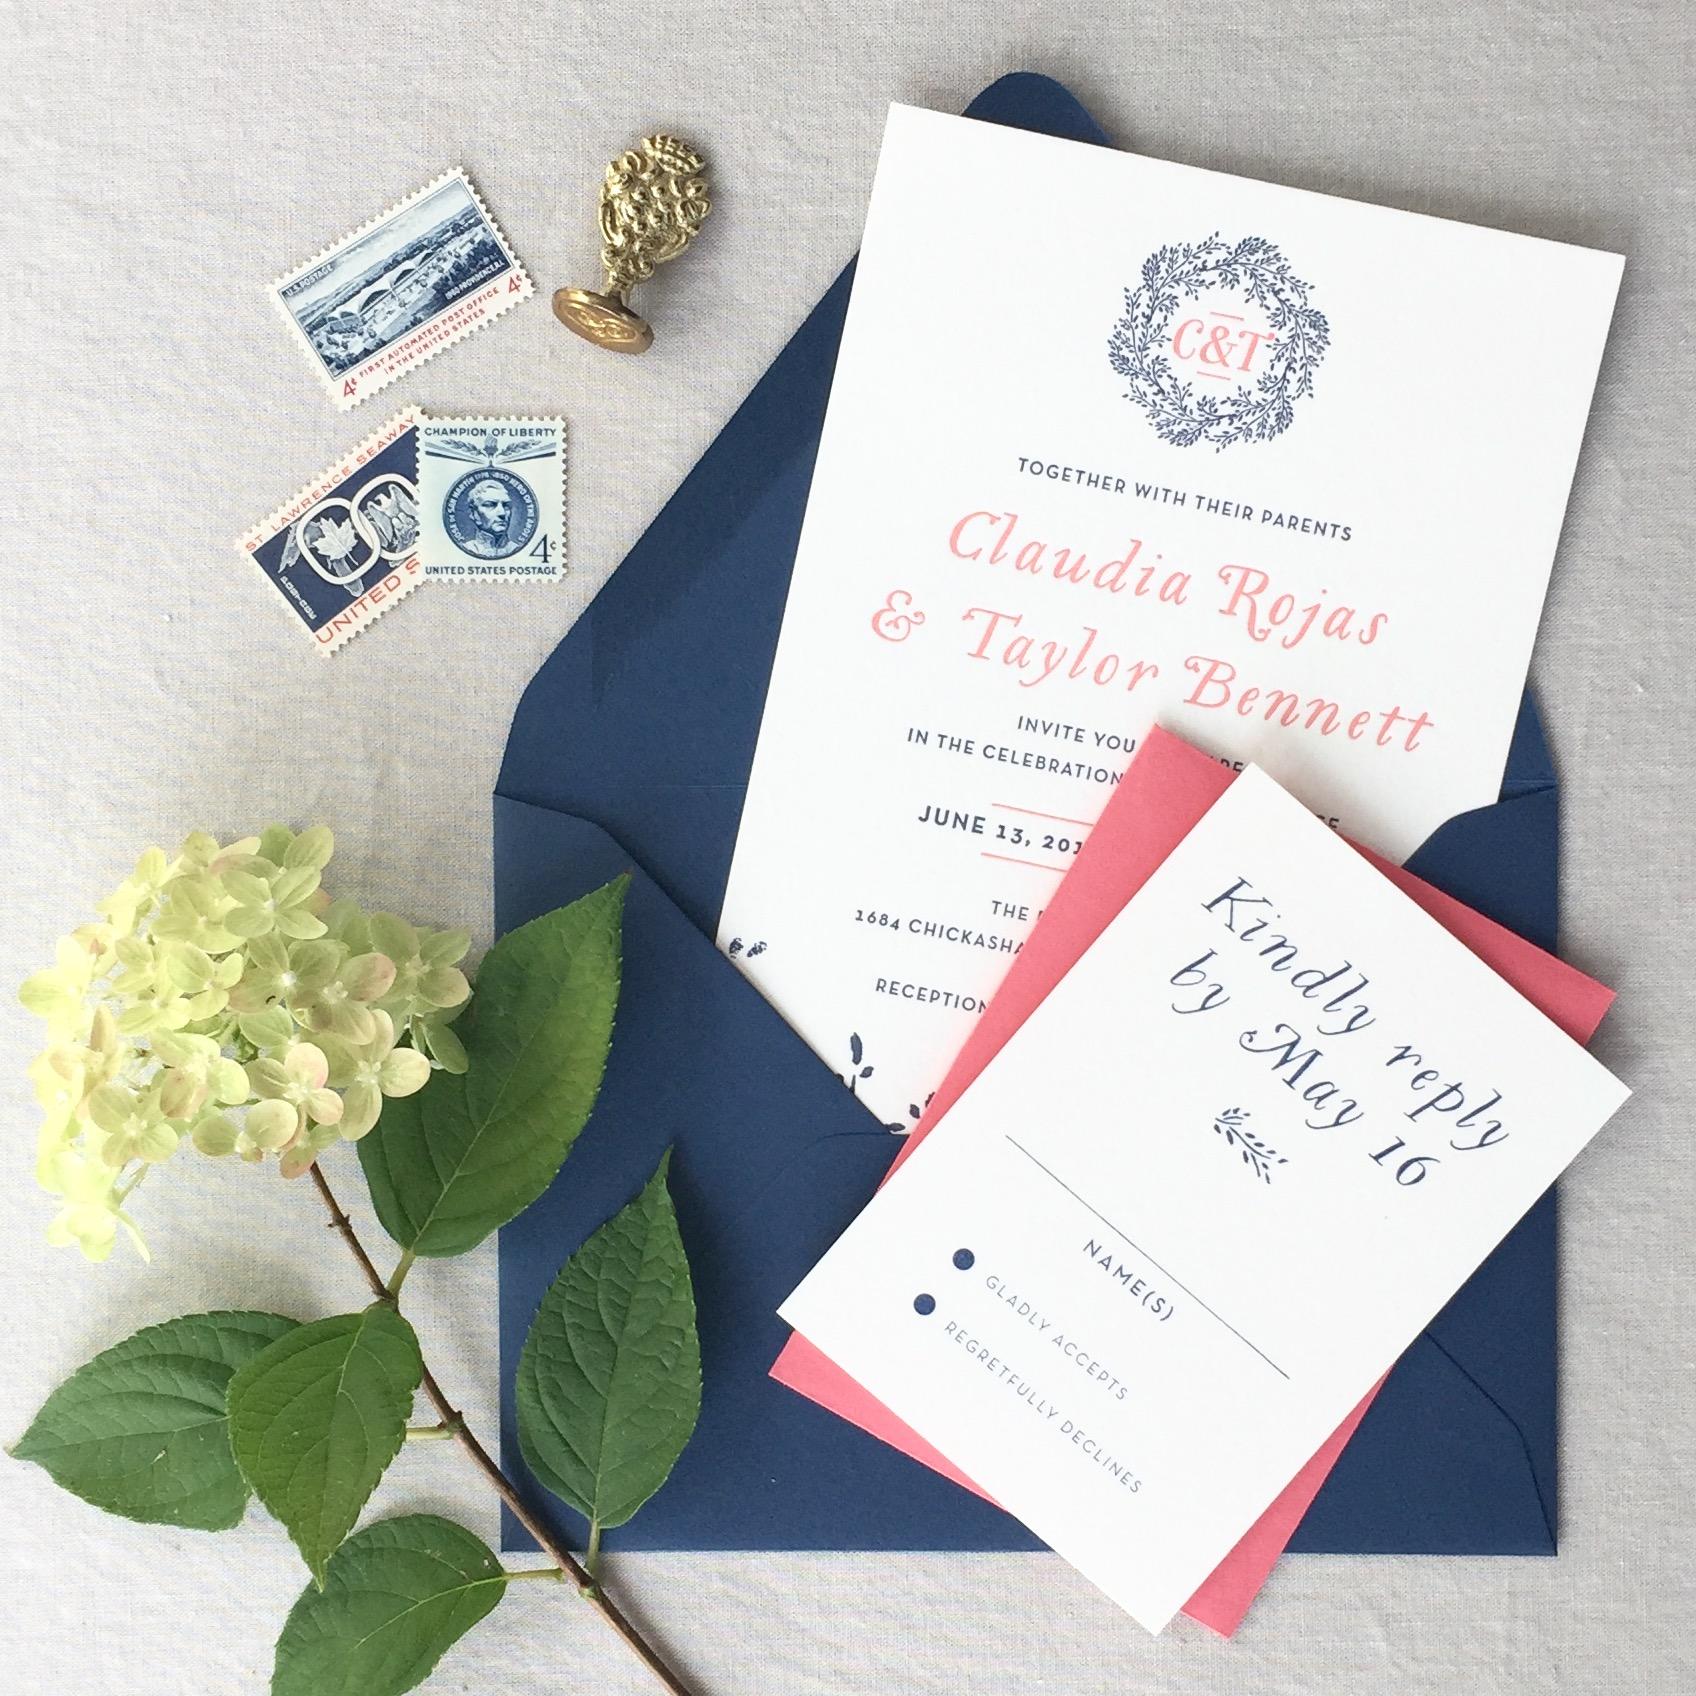 Maria_Bond_Design_North_Carolina_Wedding_Invite_3.jpg